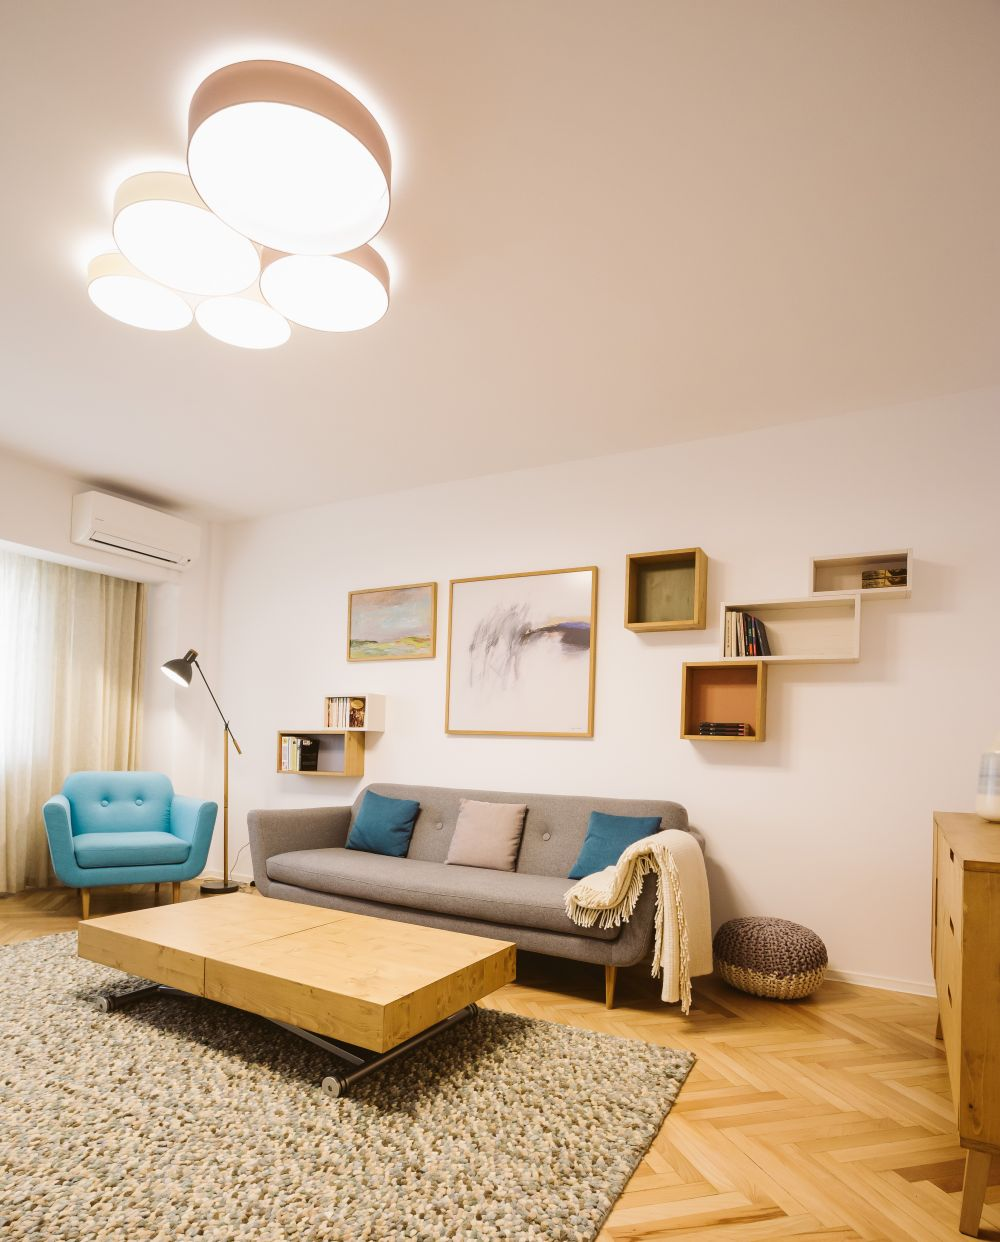 adelaparvu.com-despre-apartament-3-camere-Bucuresti-reamenajat-Designer-Mihaela-Cetanas-Foto-Cezar-Buliga-2